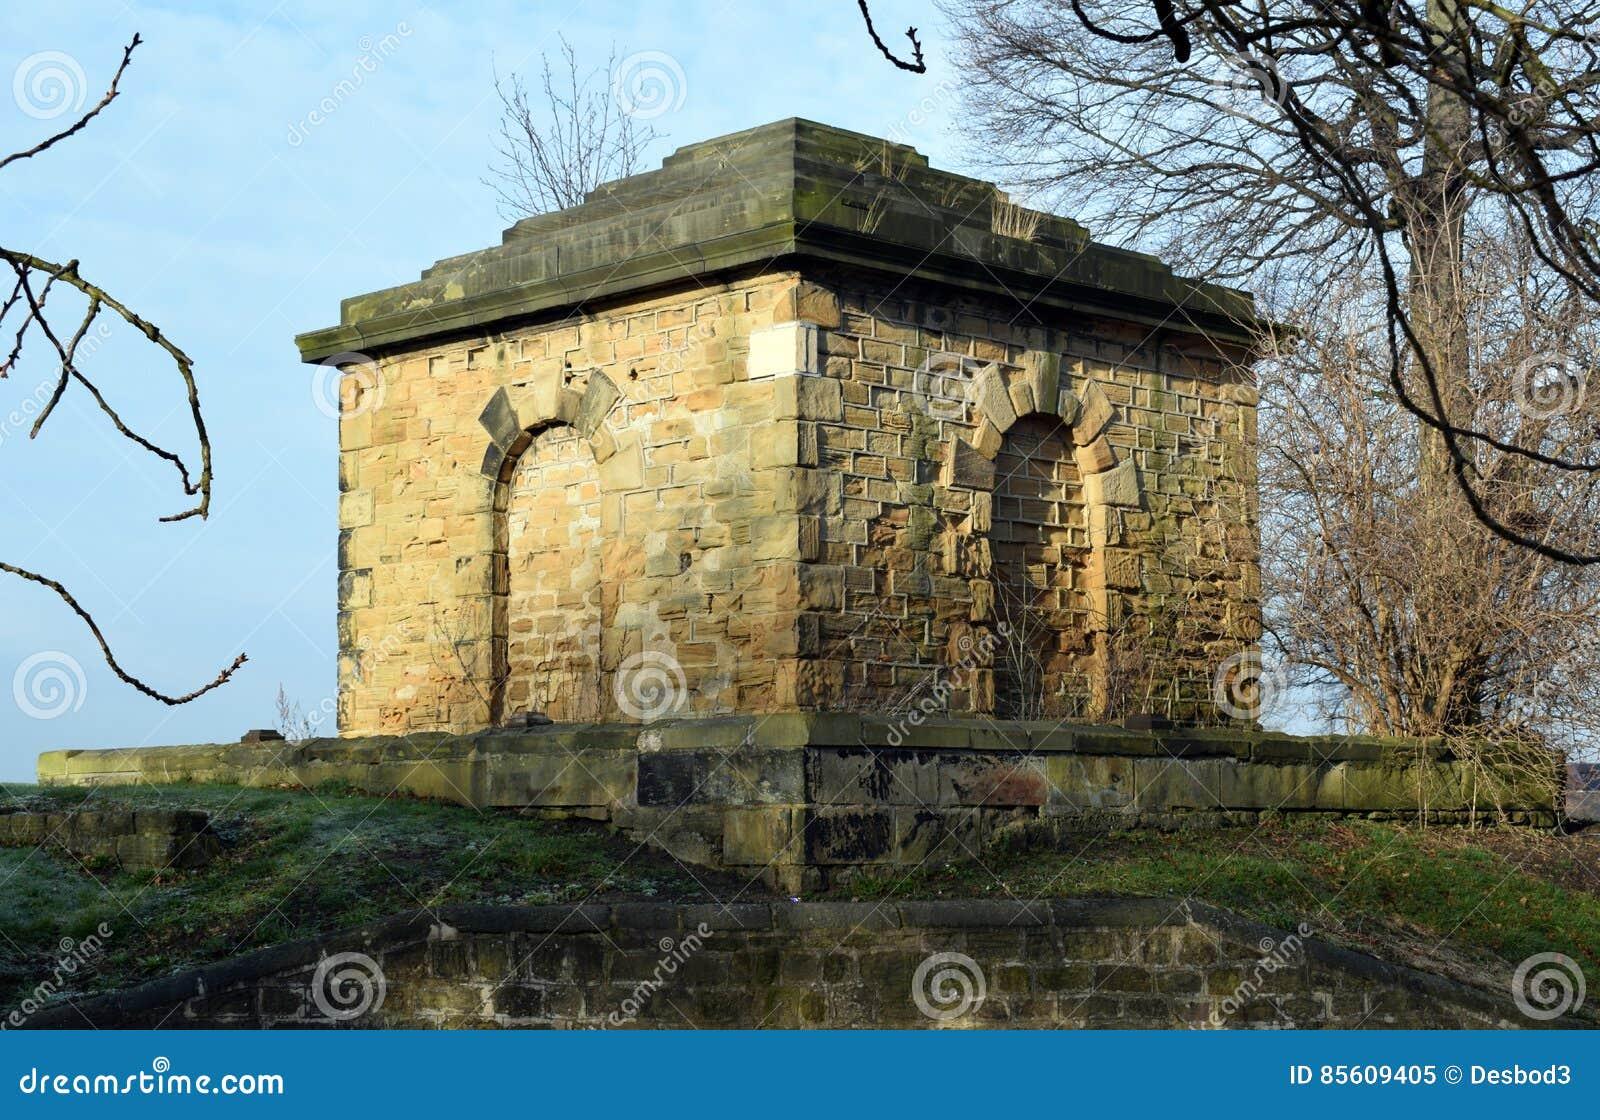 Payne Mausoleum Grade 2 Listed English Heritage Building